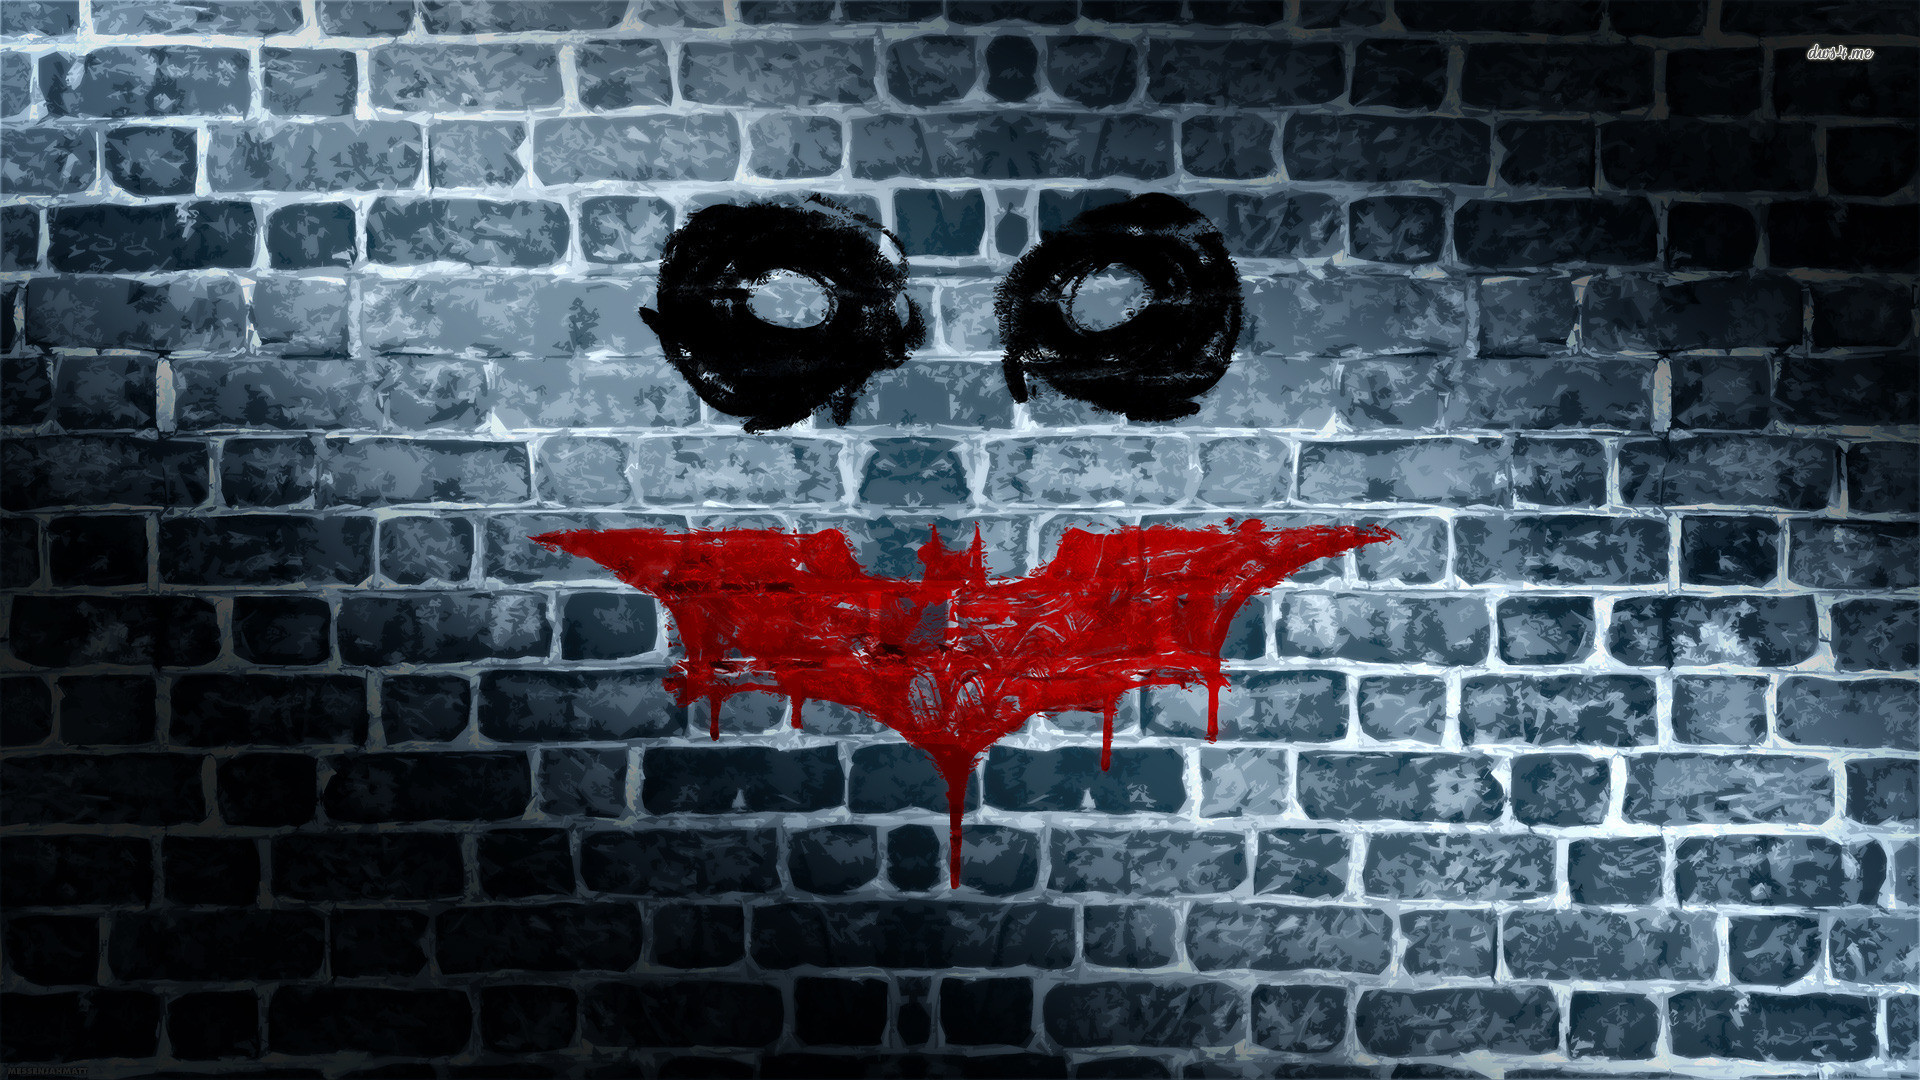 Batman Logo Wallpapers HD. | Batman hd | Pinterest | Logos .